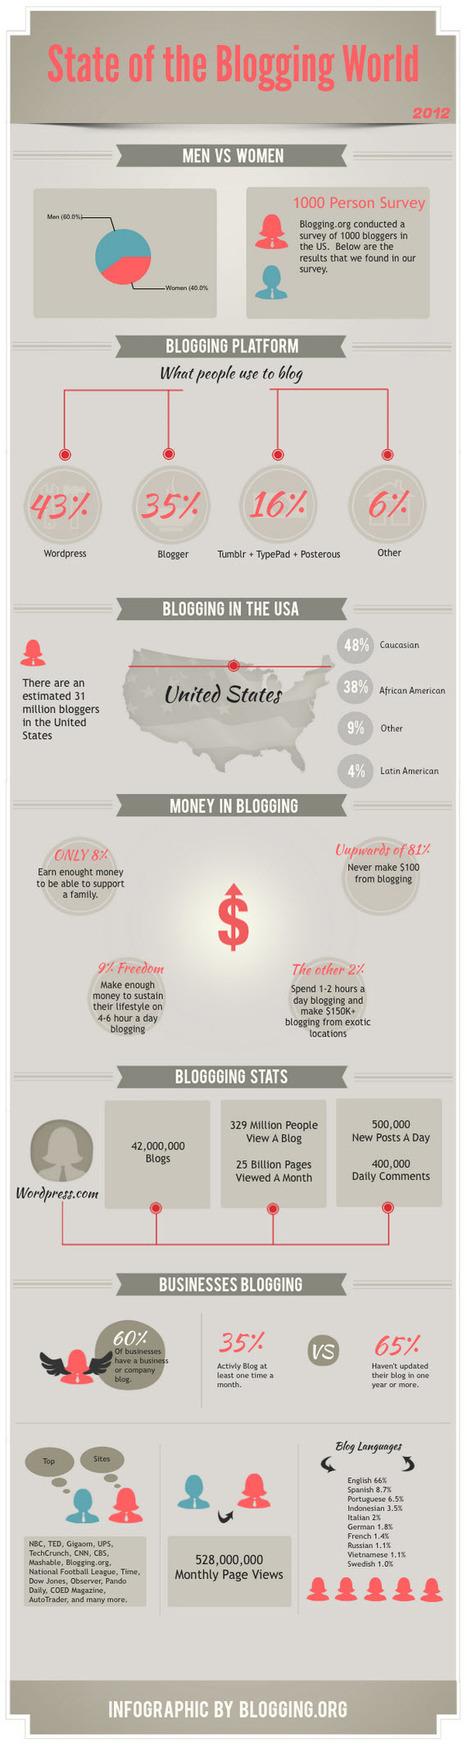 Blogging Statistics, Facts and Figures In 2012 (Infographic) | Content Development | Scoop.it